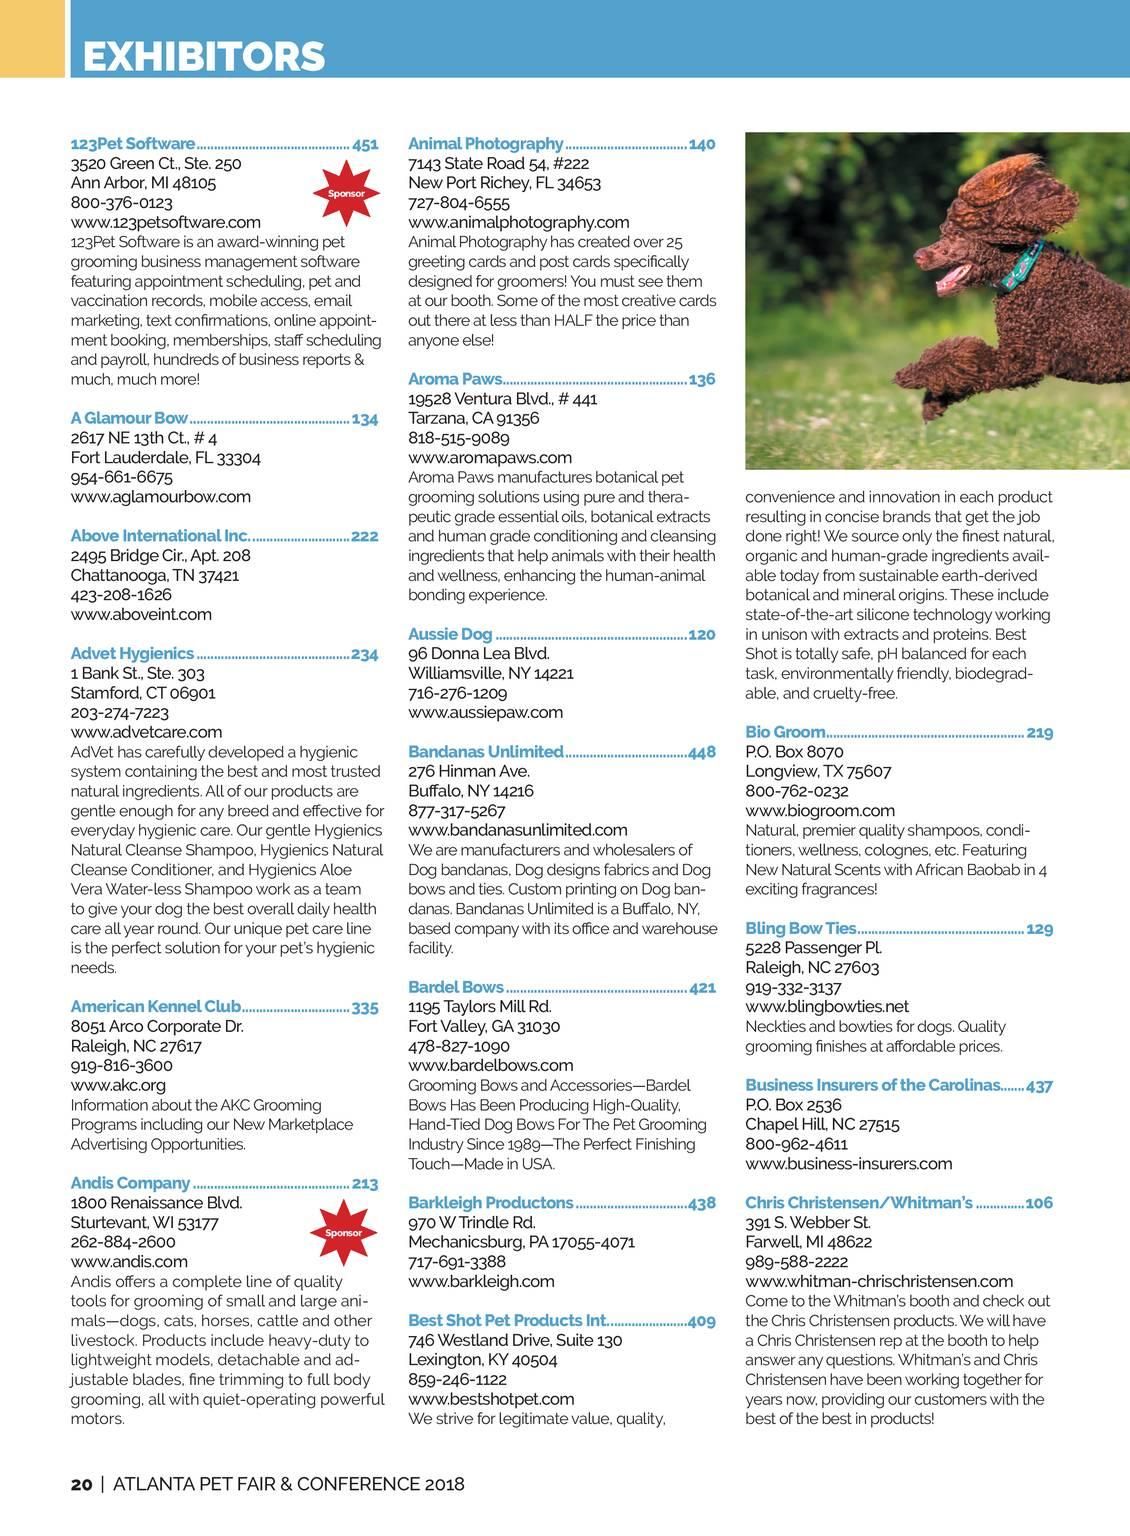 Pet Product News - Atlanta Pet Fair 2018 - page 21